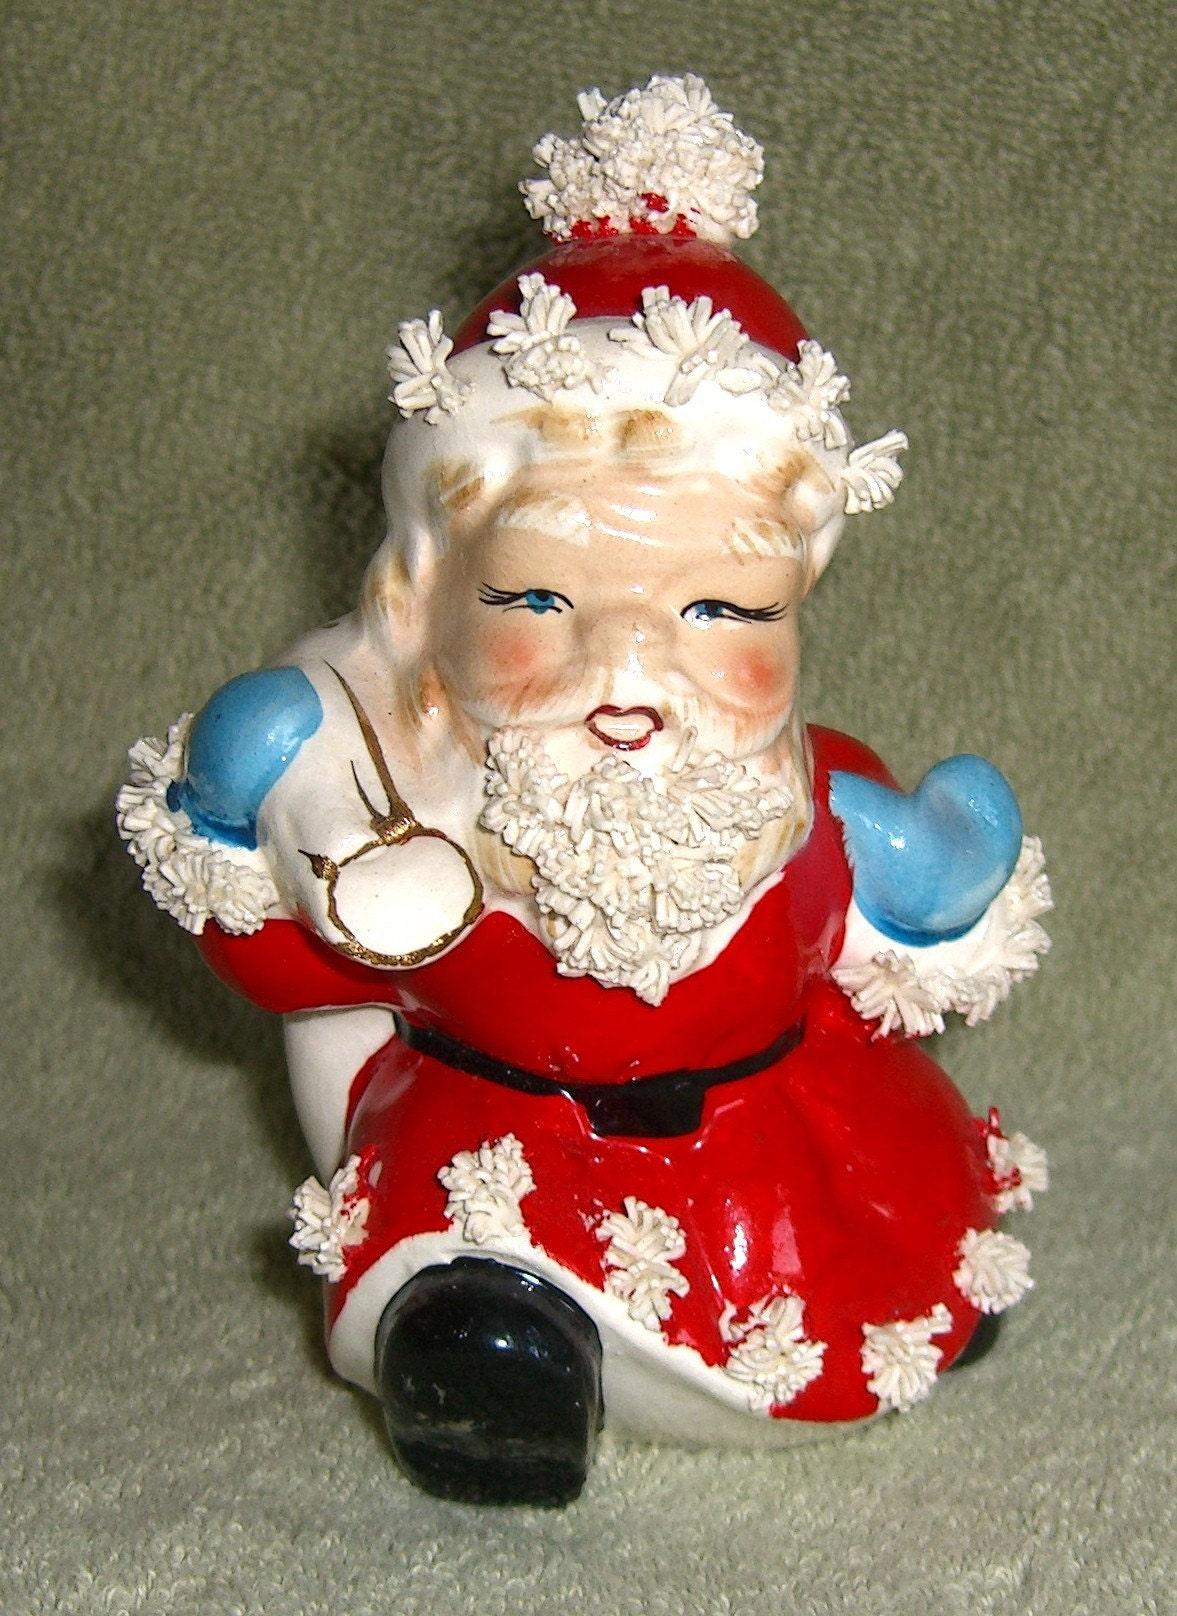 Vintage spaghetti santa claus figurine blue eyes s